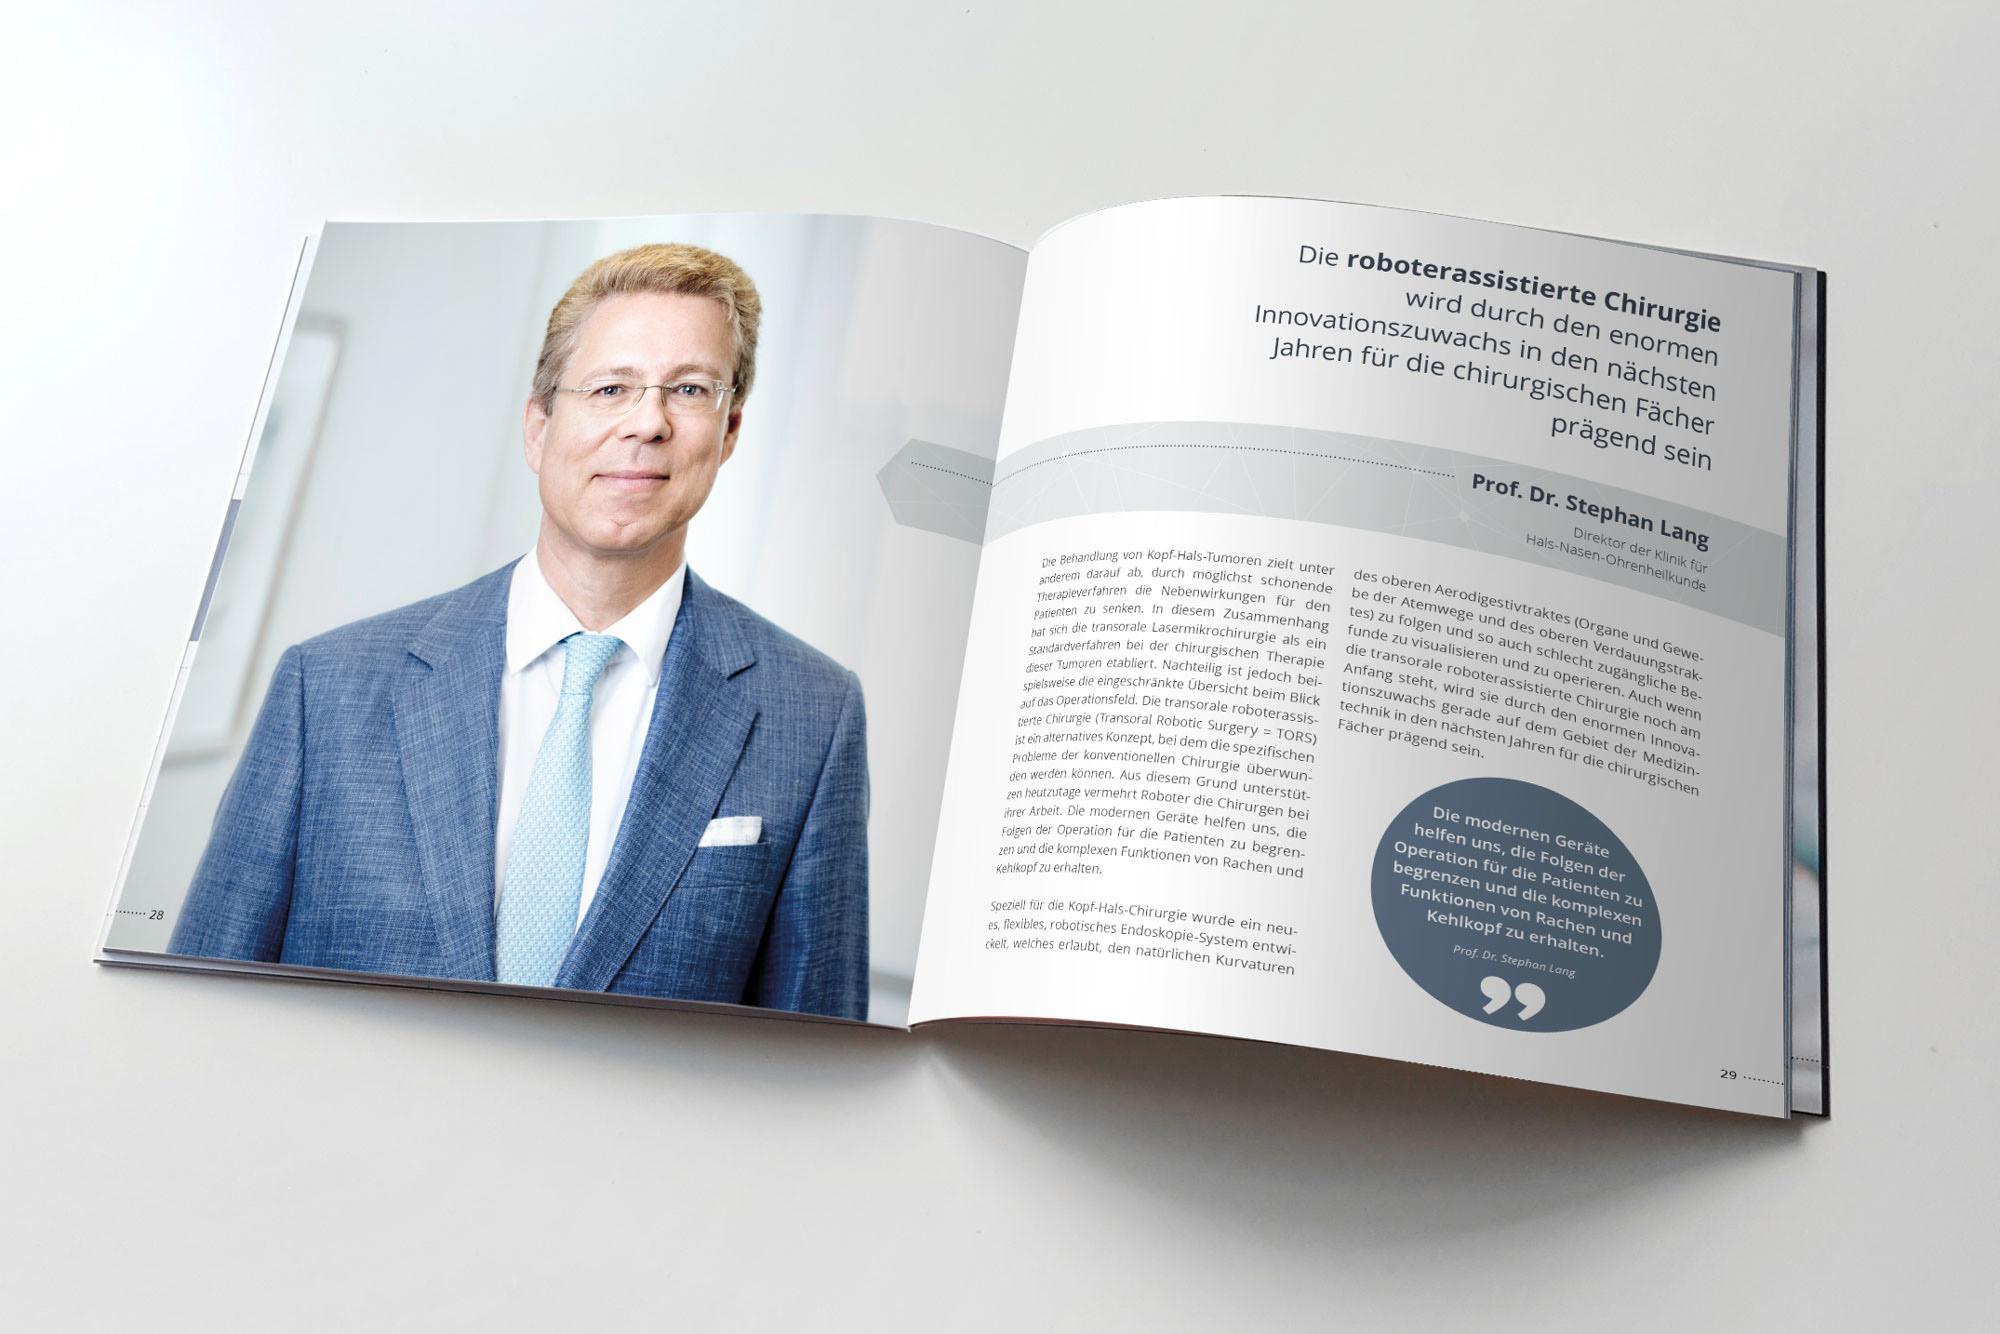 Prof Dr Stephan Lang, Uniklinikum Essen